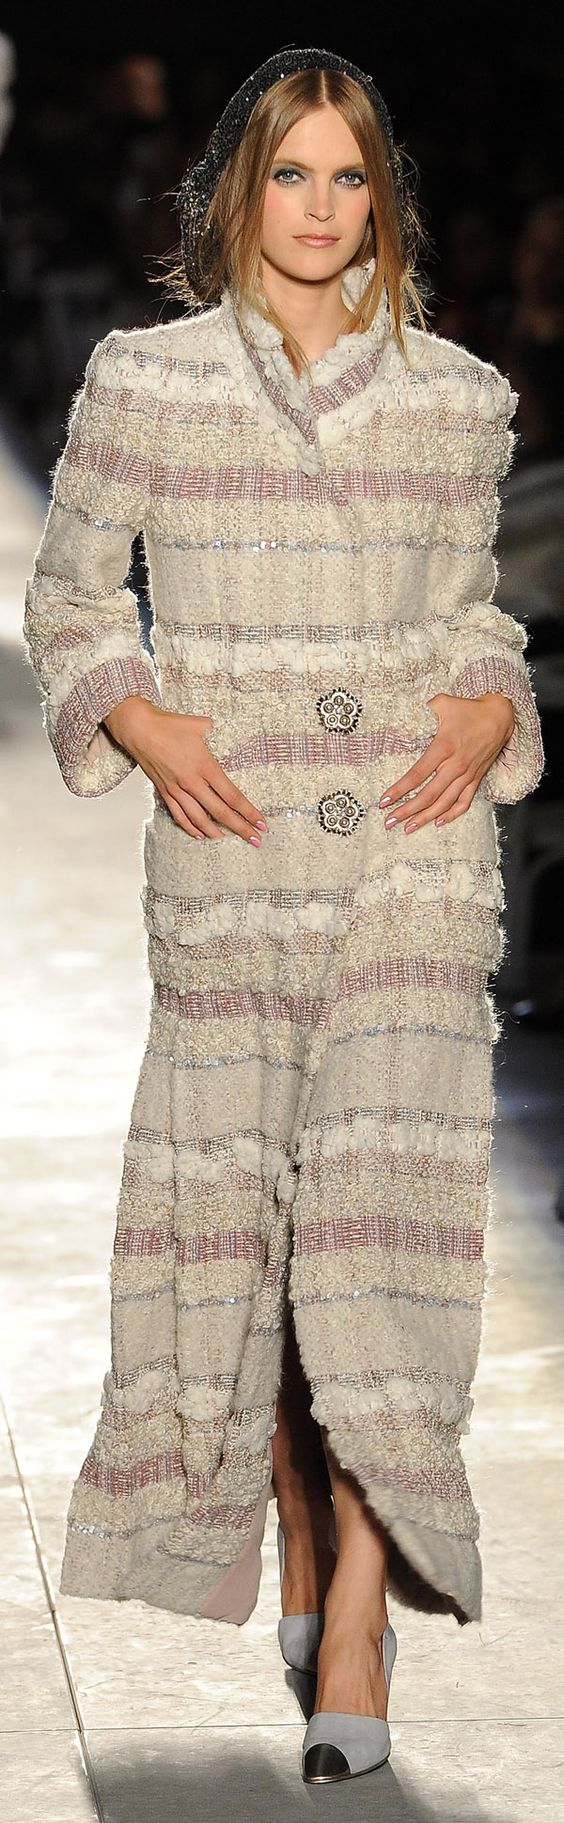 Chanel Fall 2013 Fashion Show & More Details